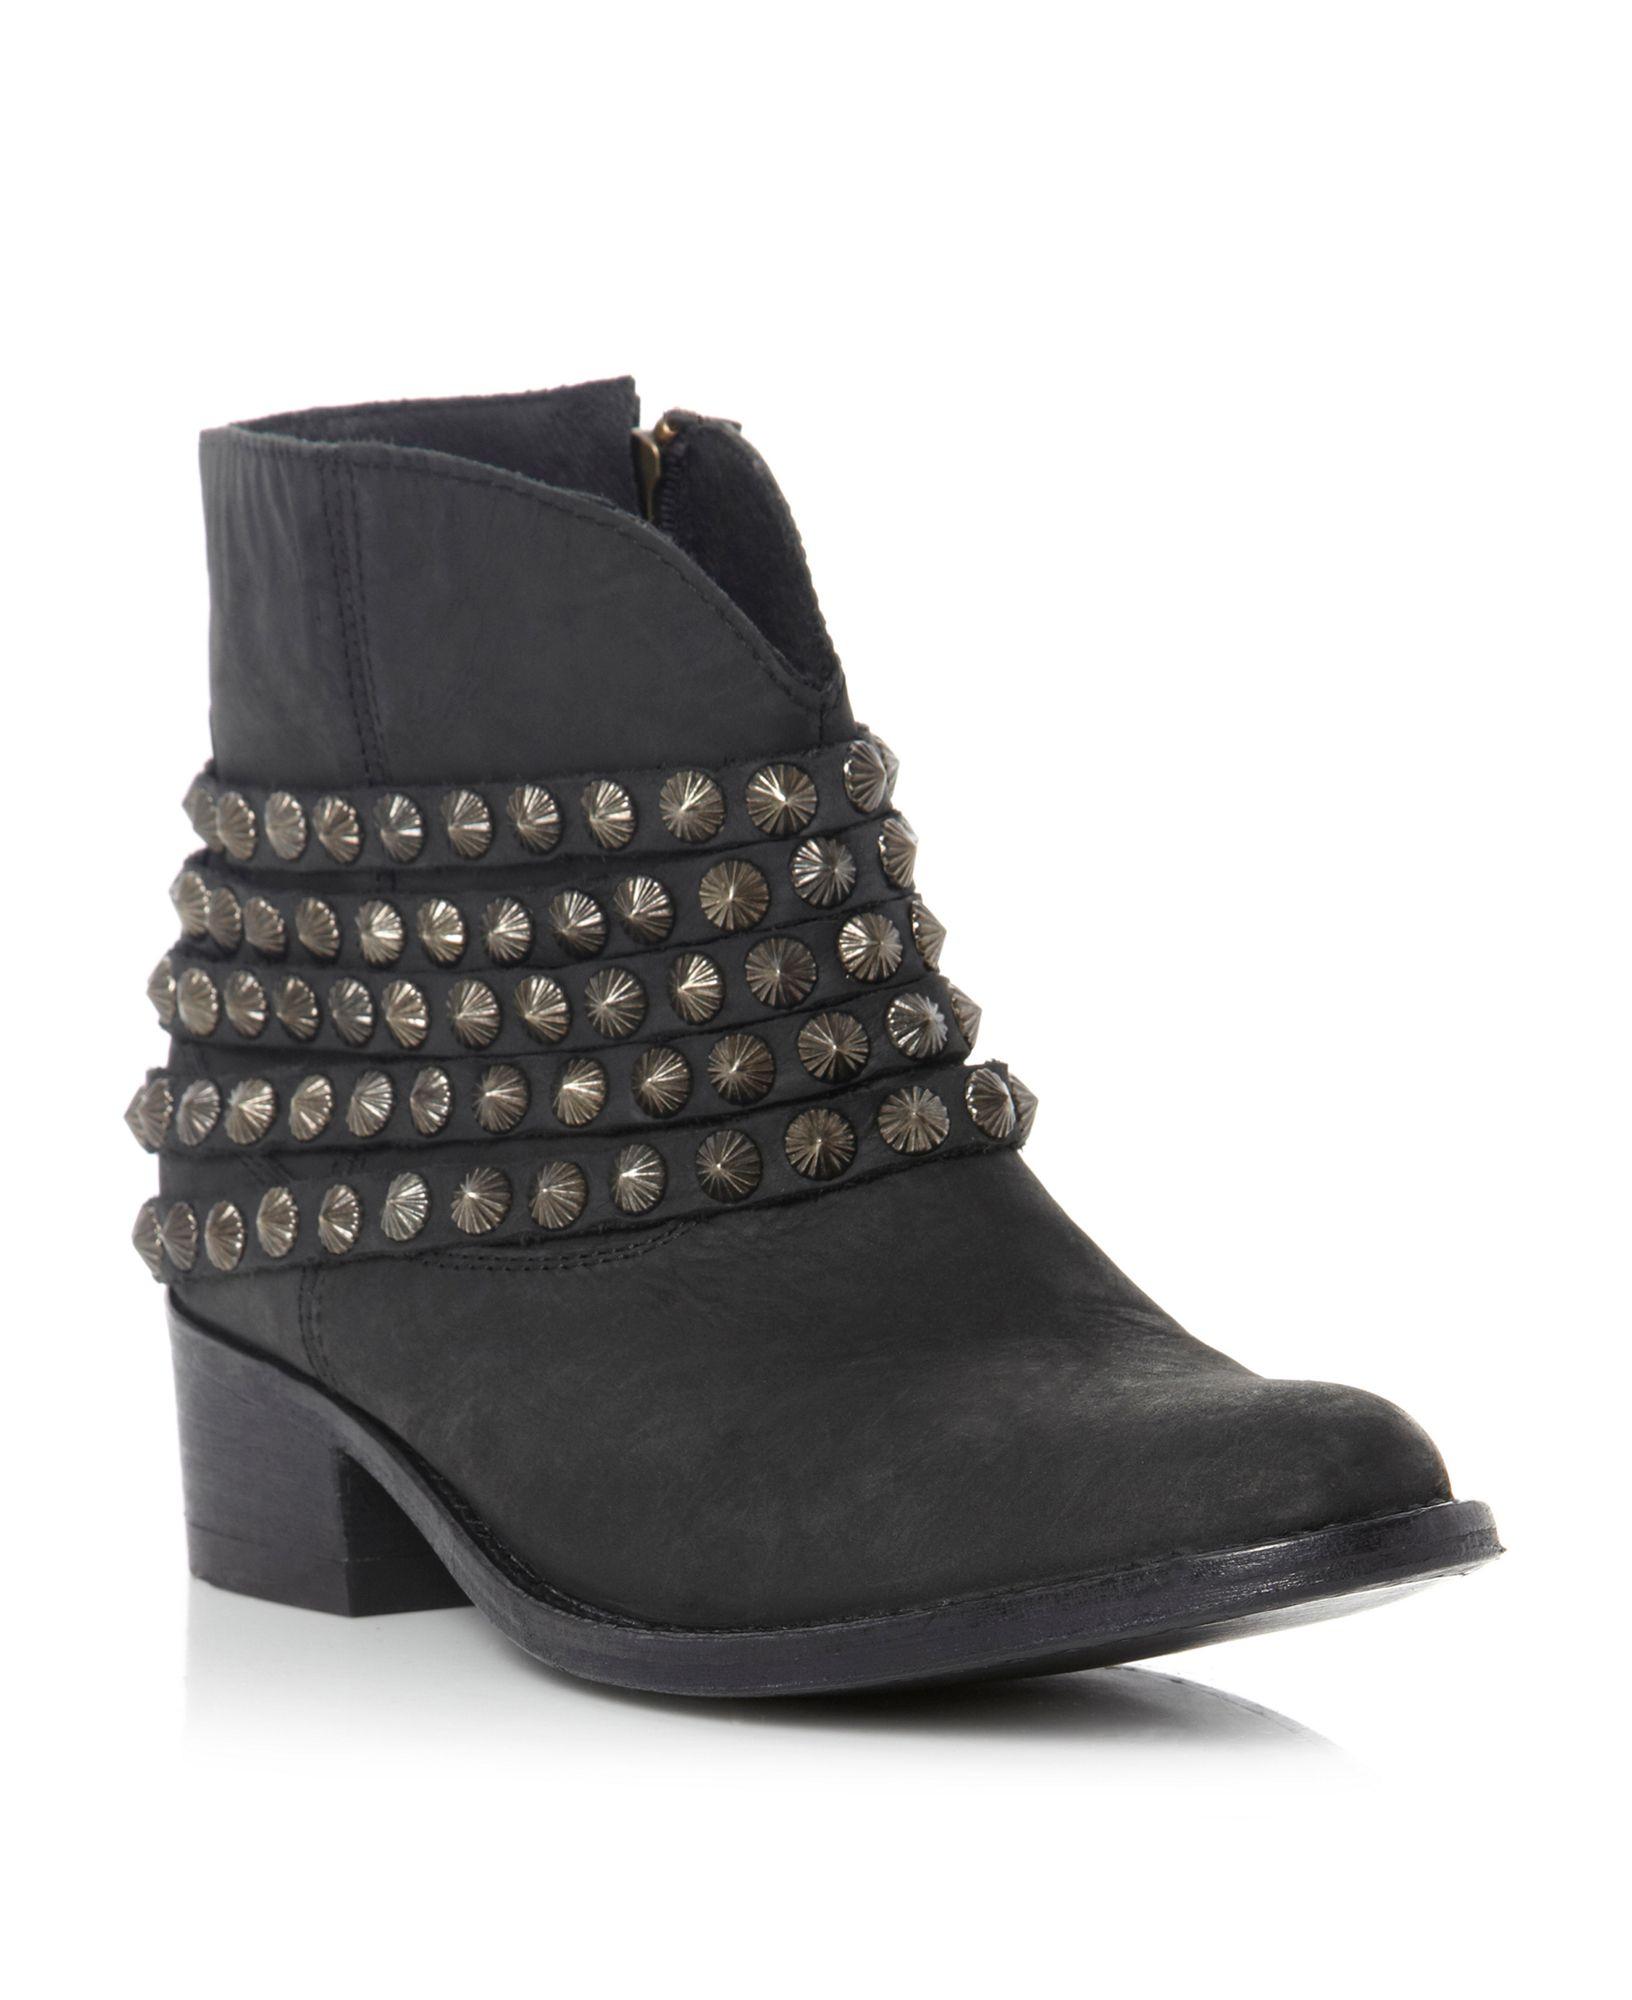 steve madden jaane stud ankle boots in black black